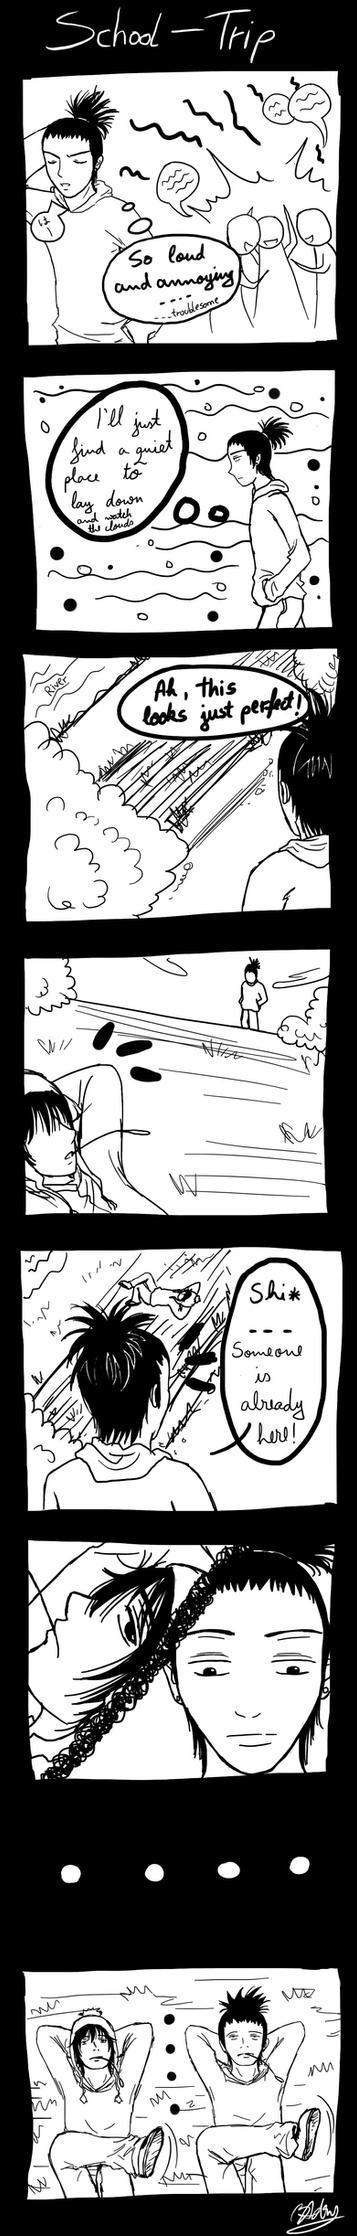 Shikamaru meets Craig by Azareea